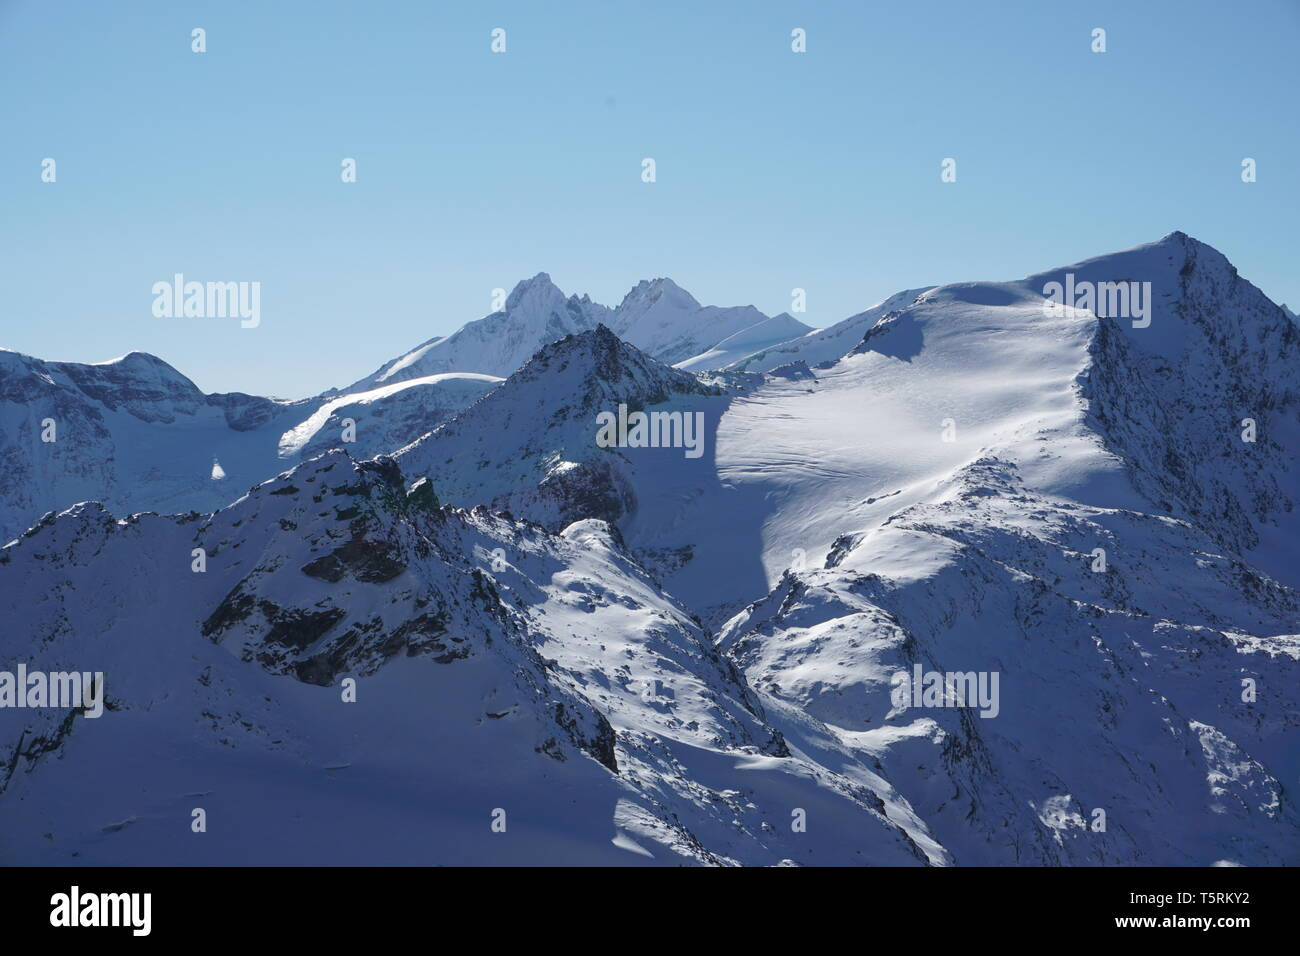 Winterwunderland   Wunderschöne Berglandschaft Stock Photo